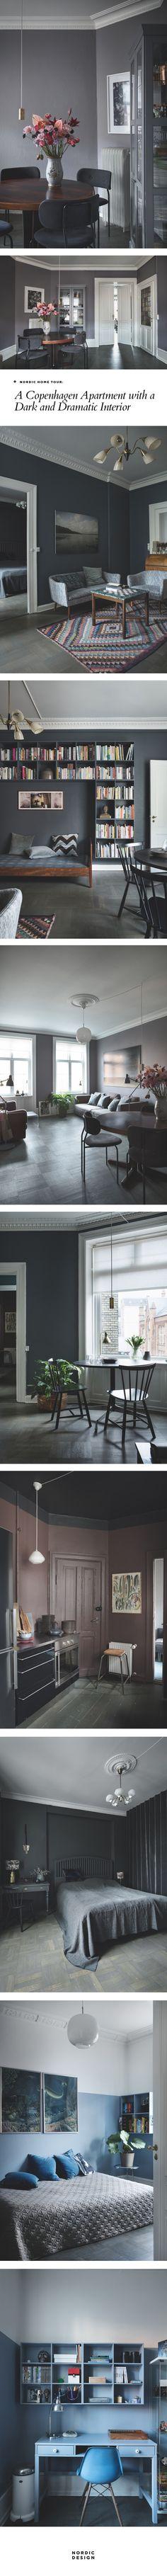 Nordic Home Tour: A Copenhagen apartment with a dark and dramatic interior | NORDIC DESIGN